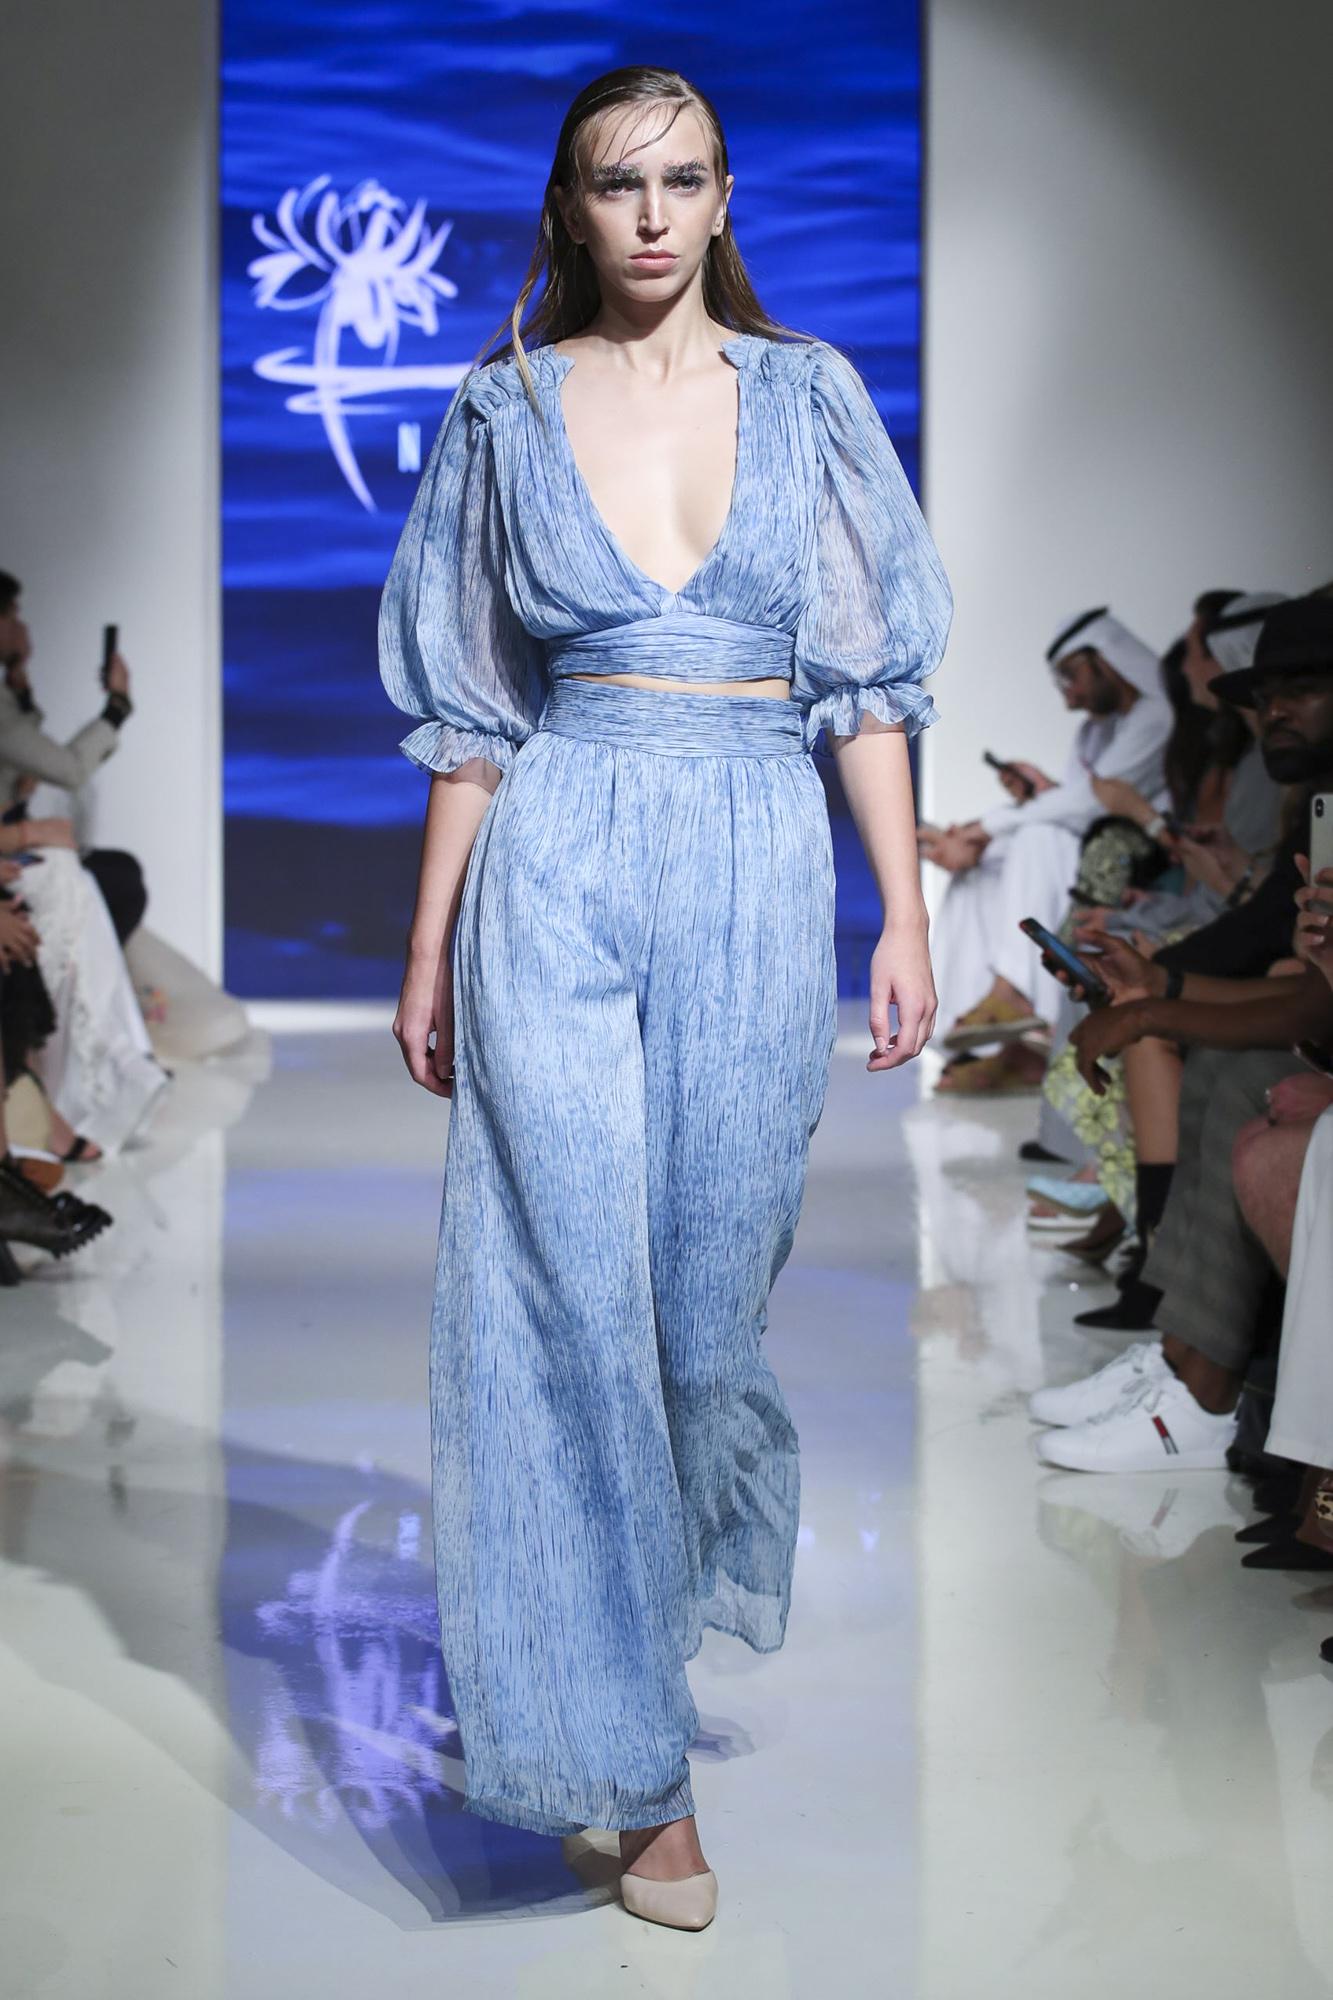 Nirmooha fashion show, Arab Fashion Week collection Spring Summer 2020 in Dubai